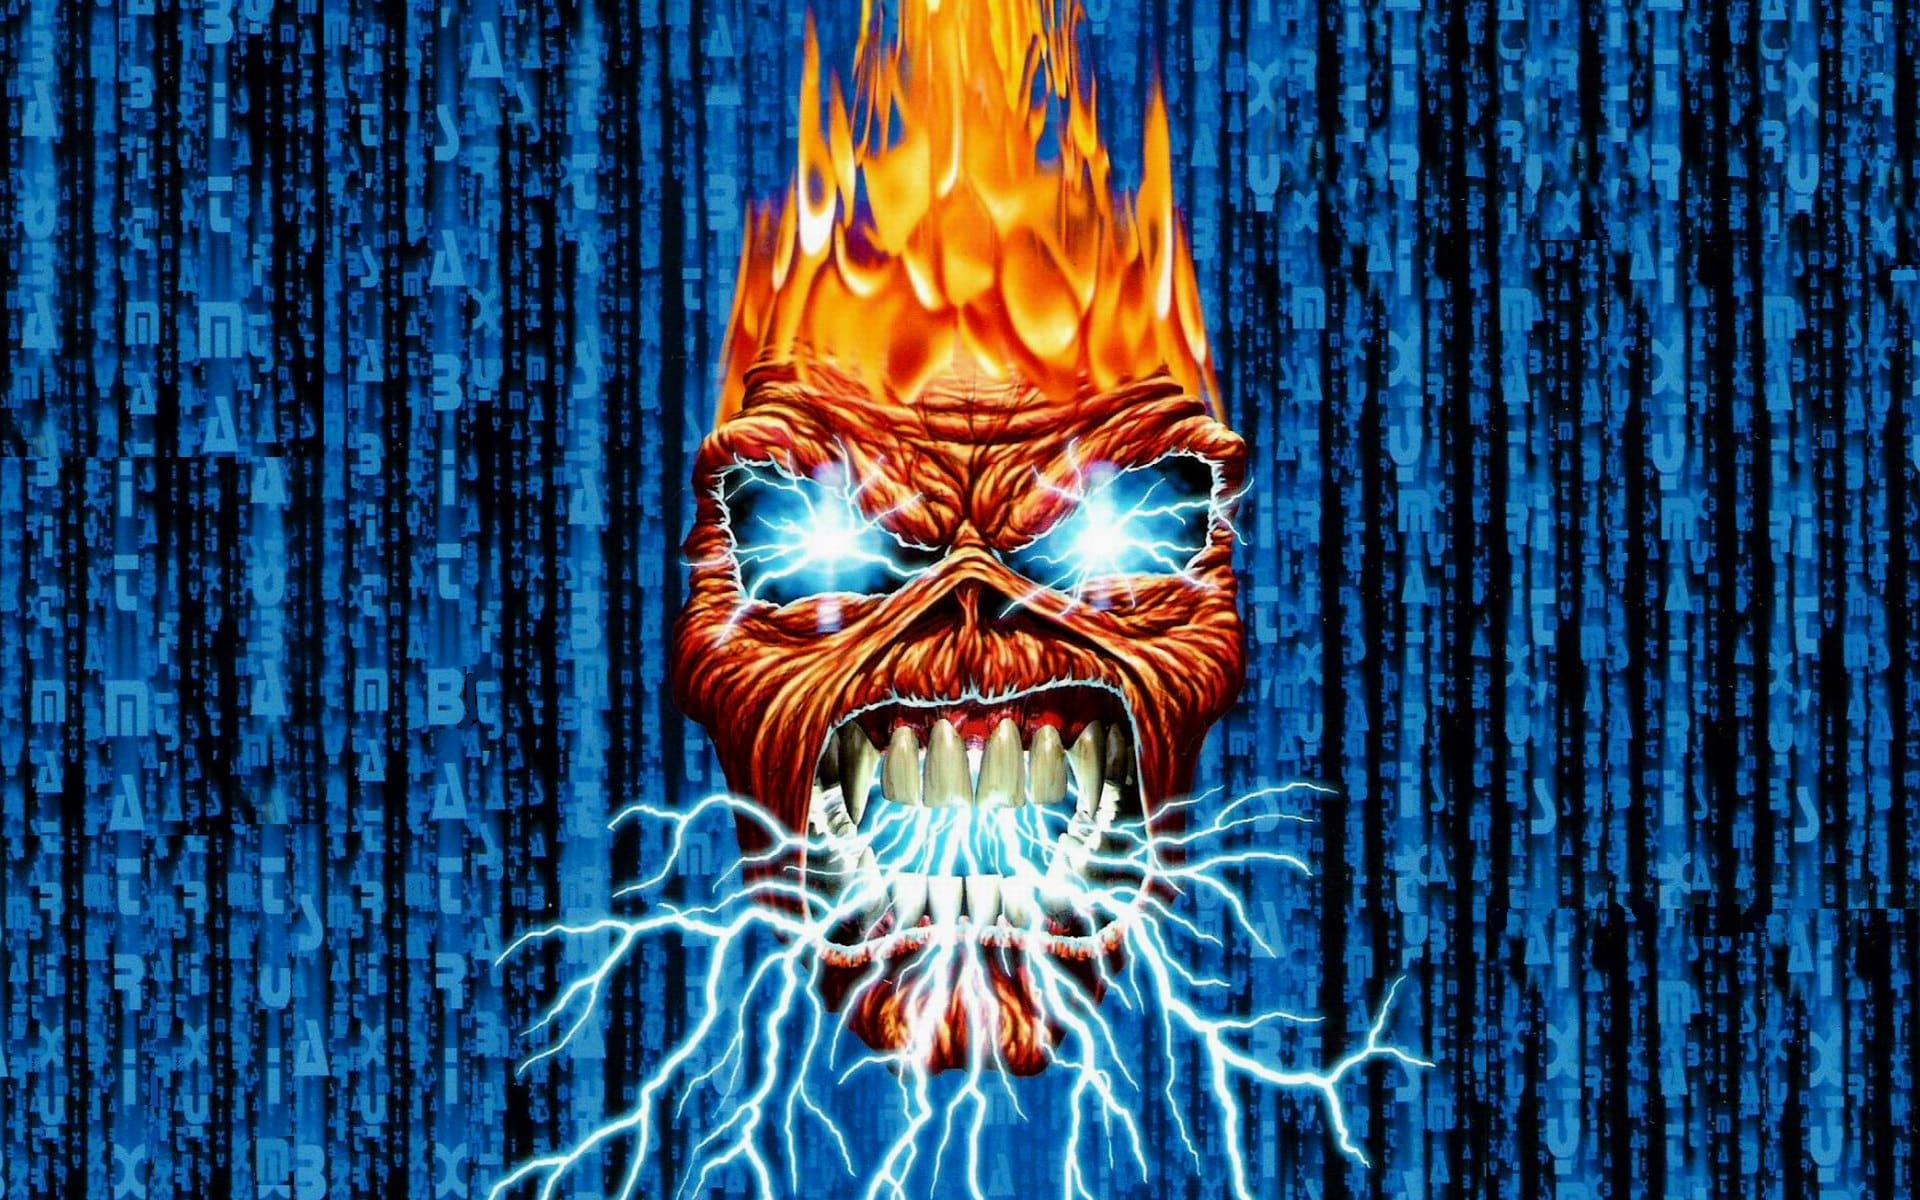 Iron Maiden Hd Wallpapers 7wallpapers Net